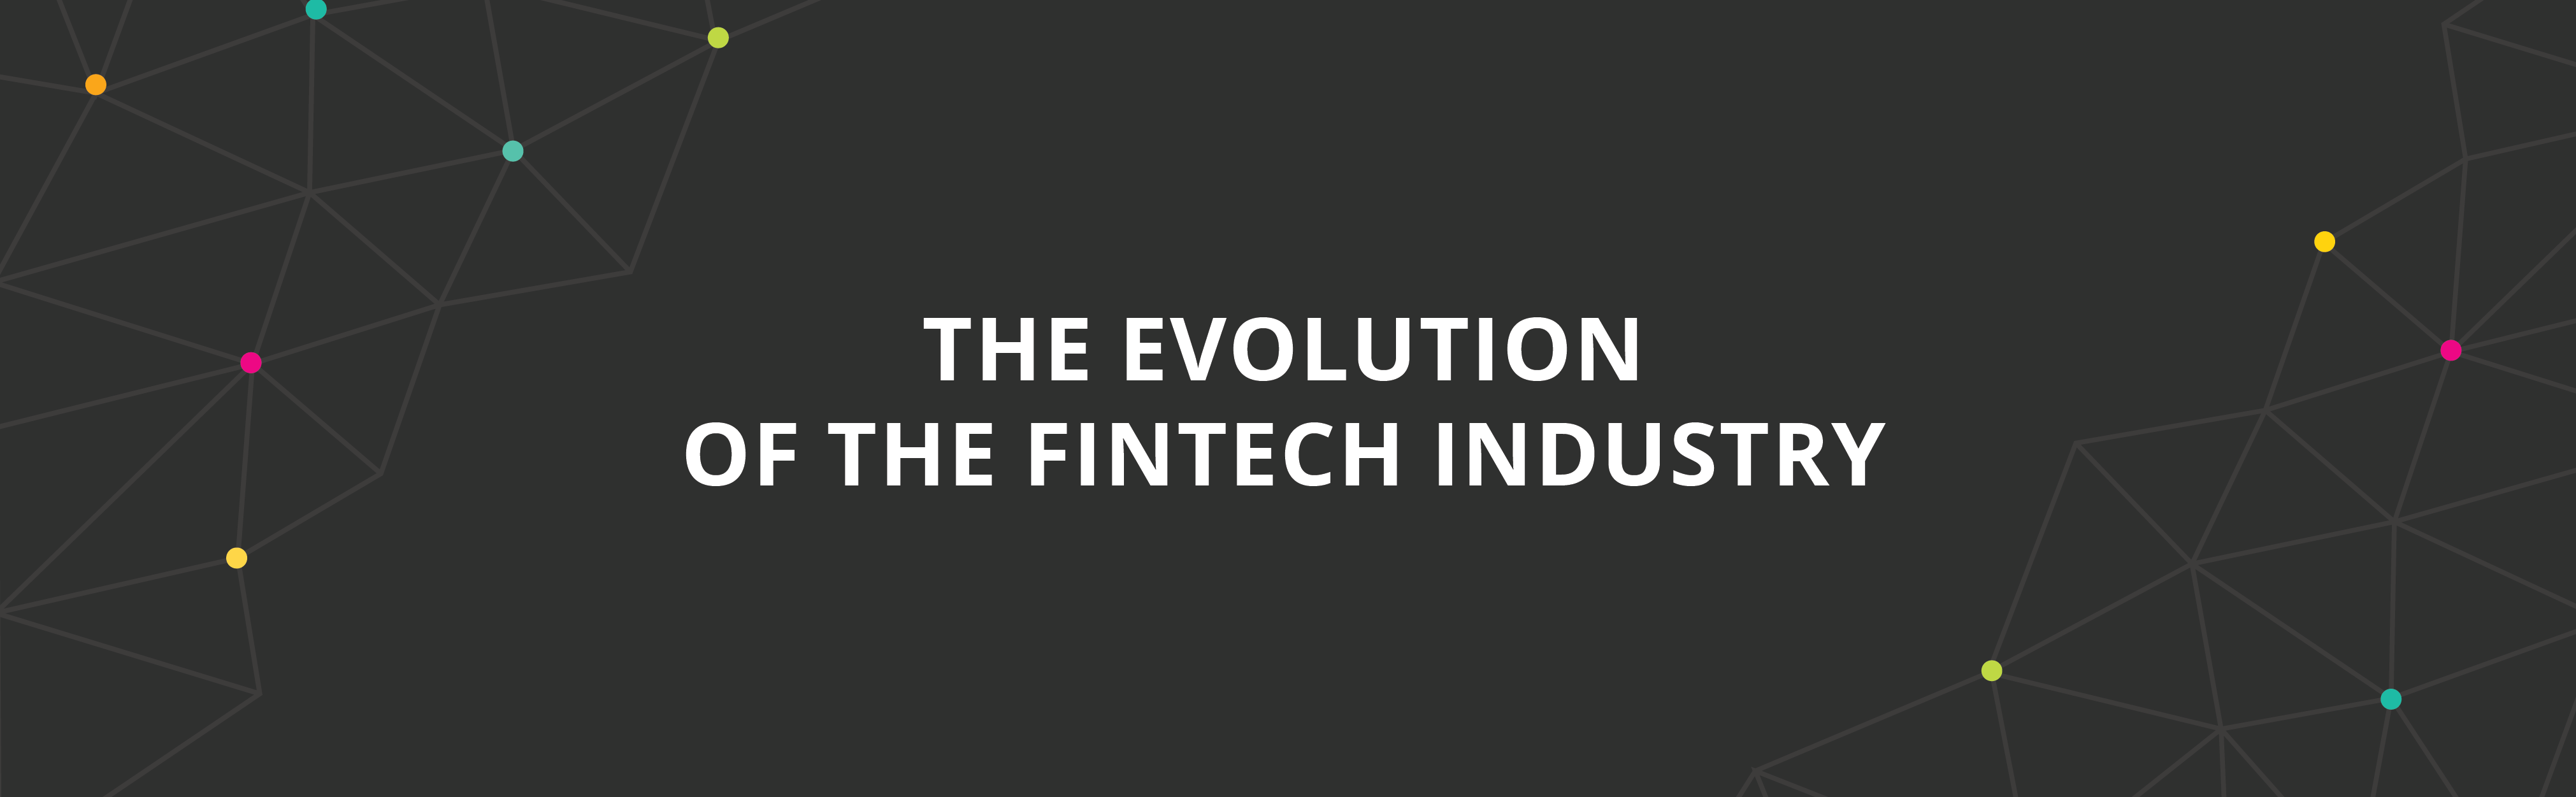 History of Fintech Hero